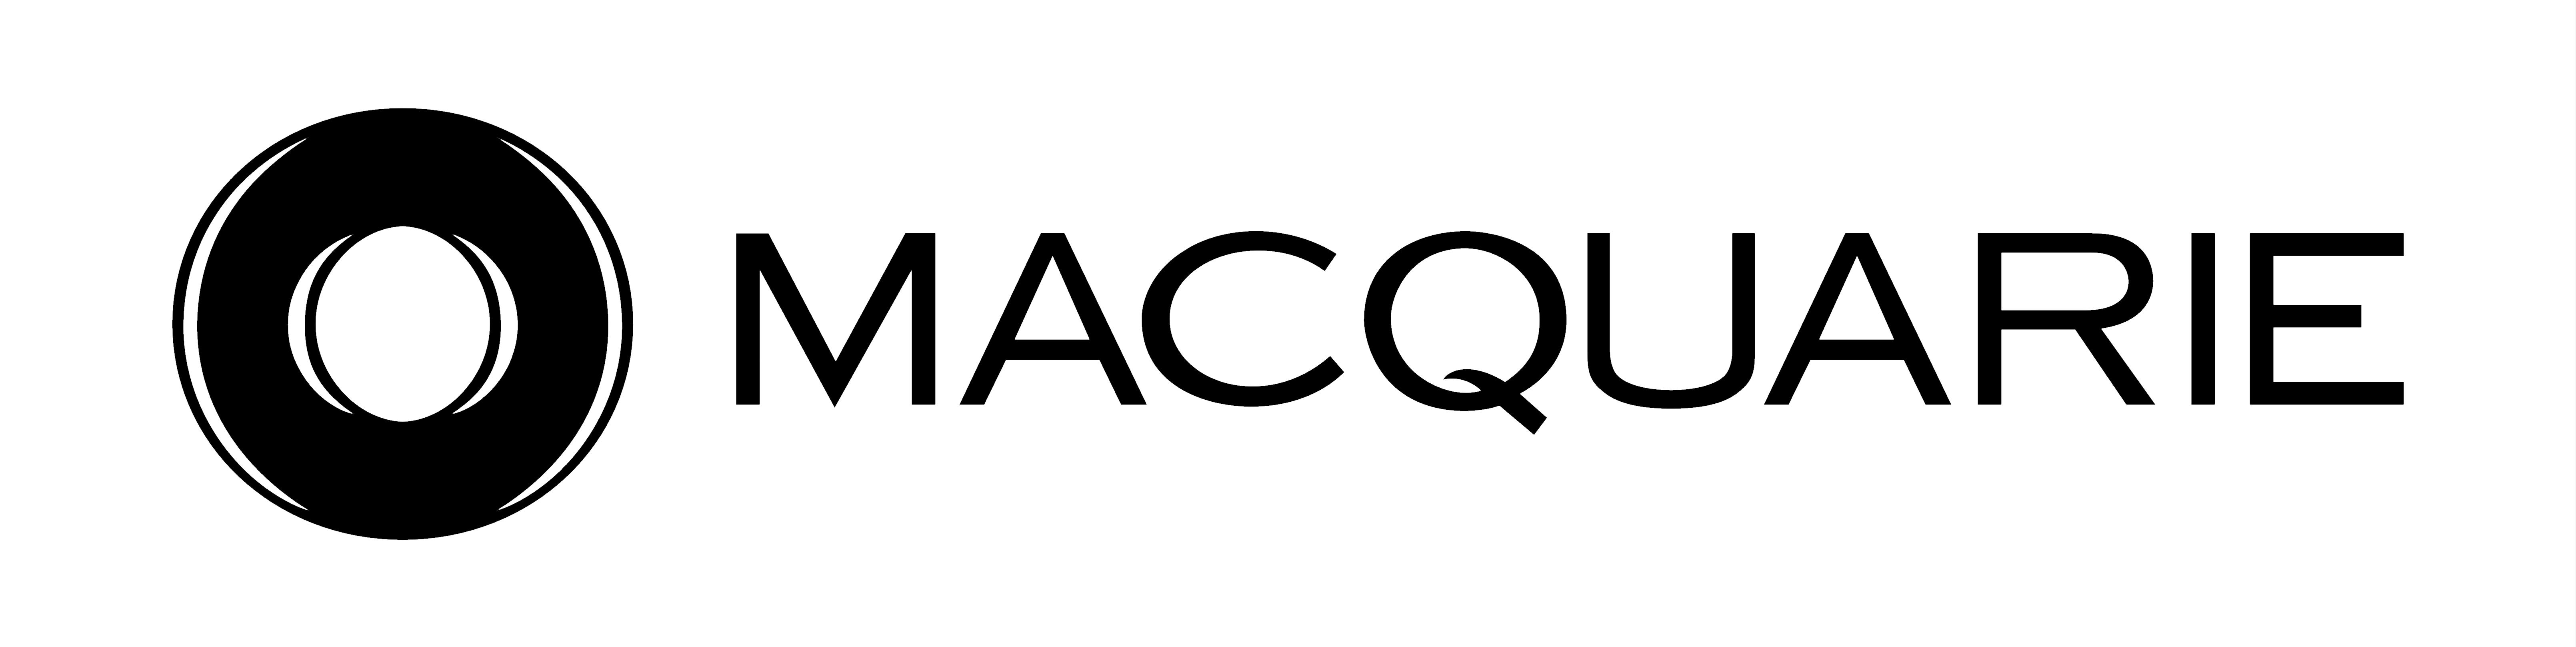 http___pluspng.com_img-png_macquarie-logo-png-macquarie-group-macquarie-logo-6440